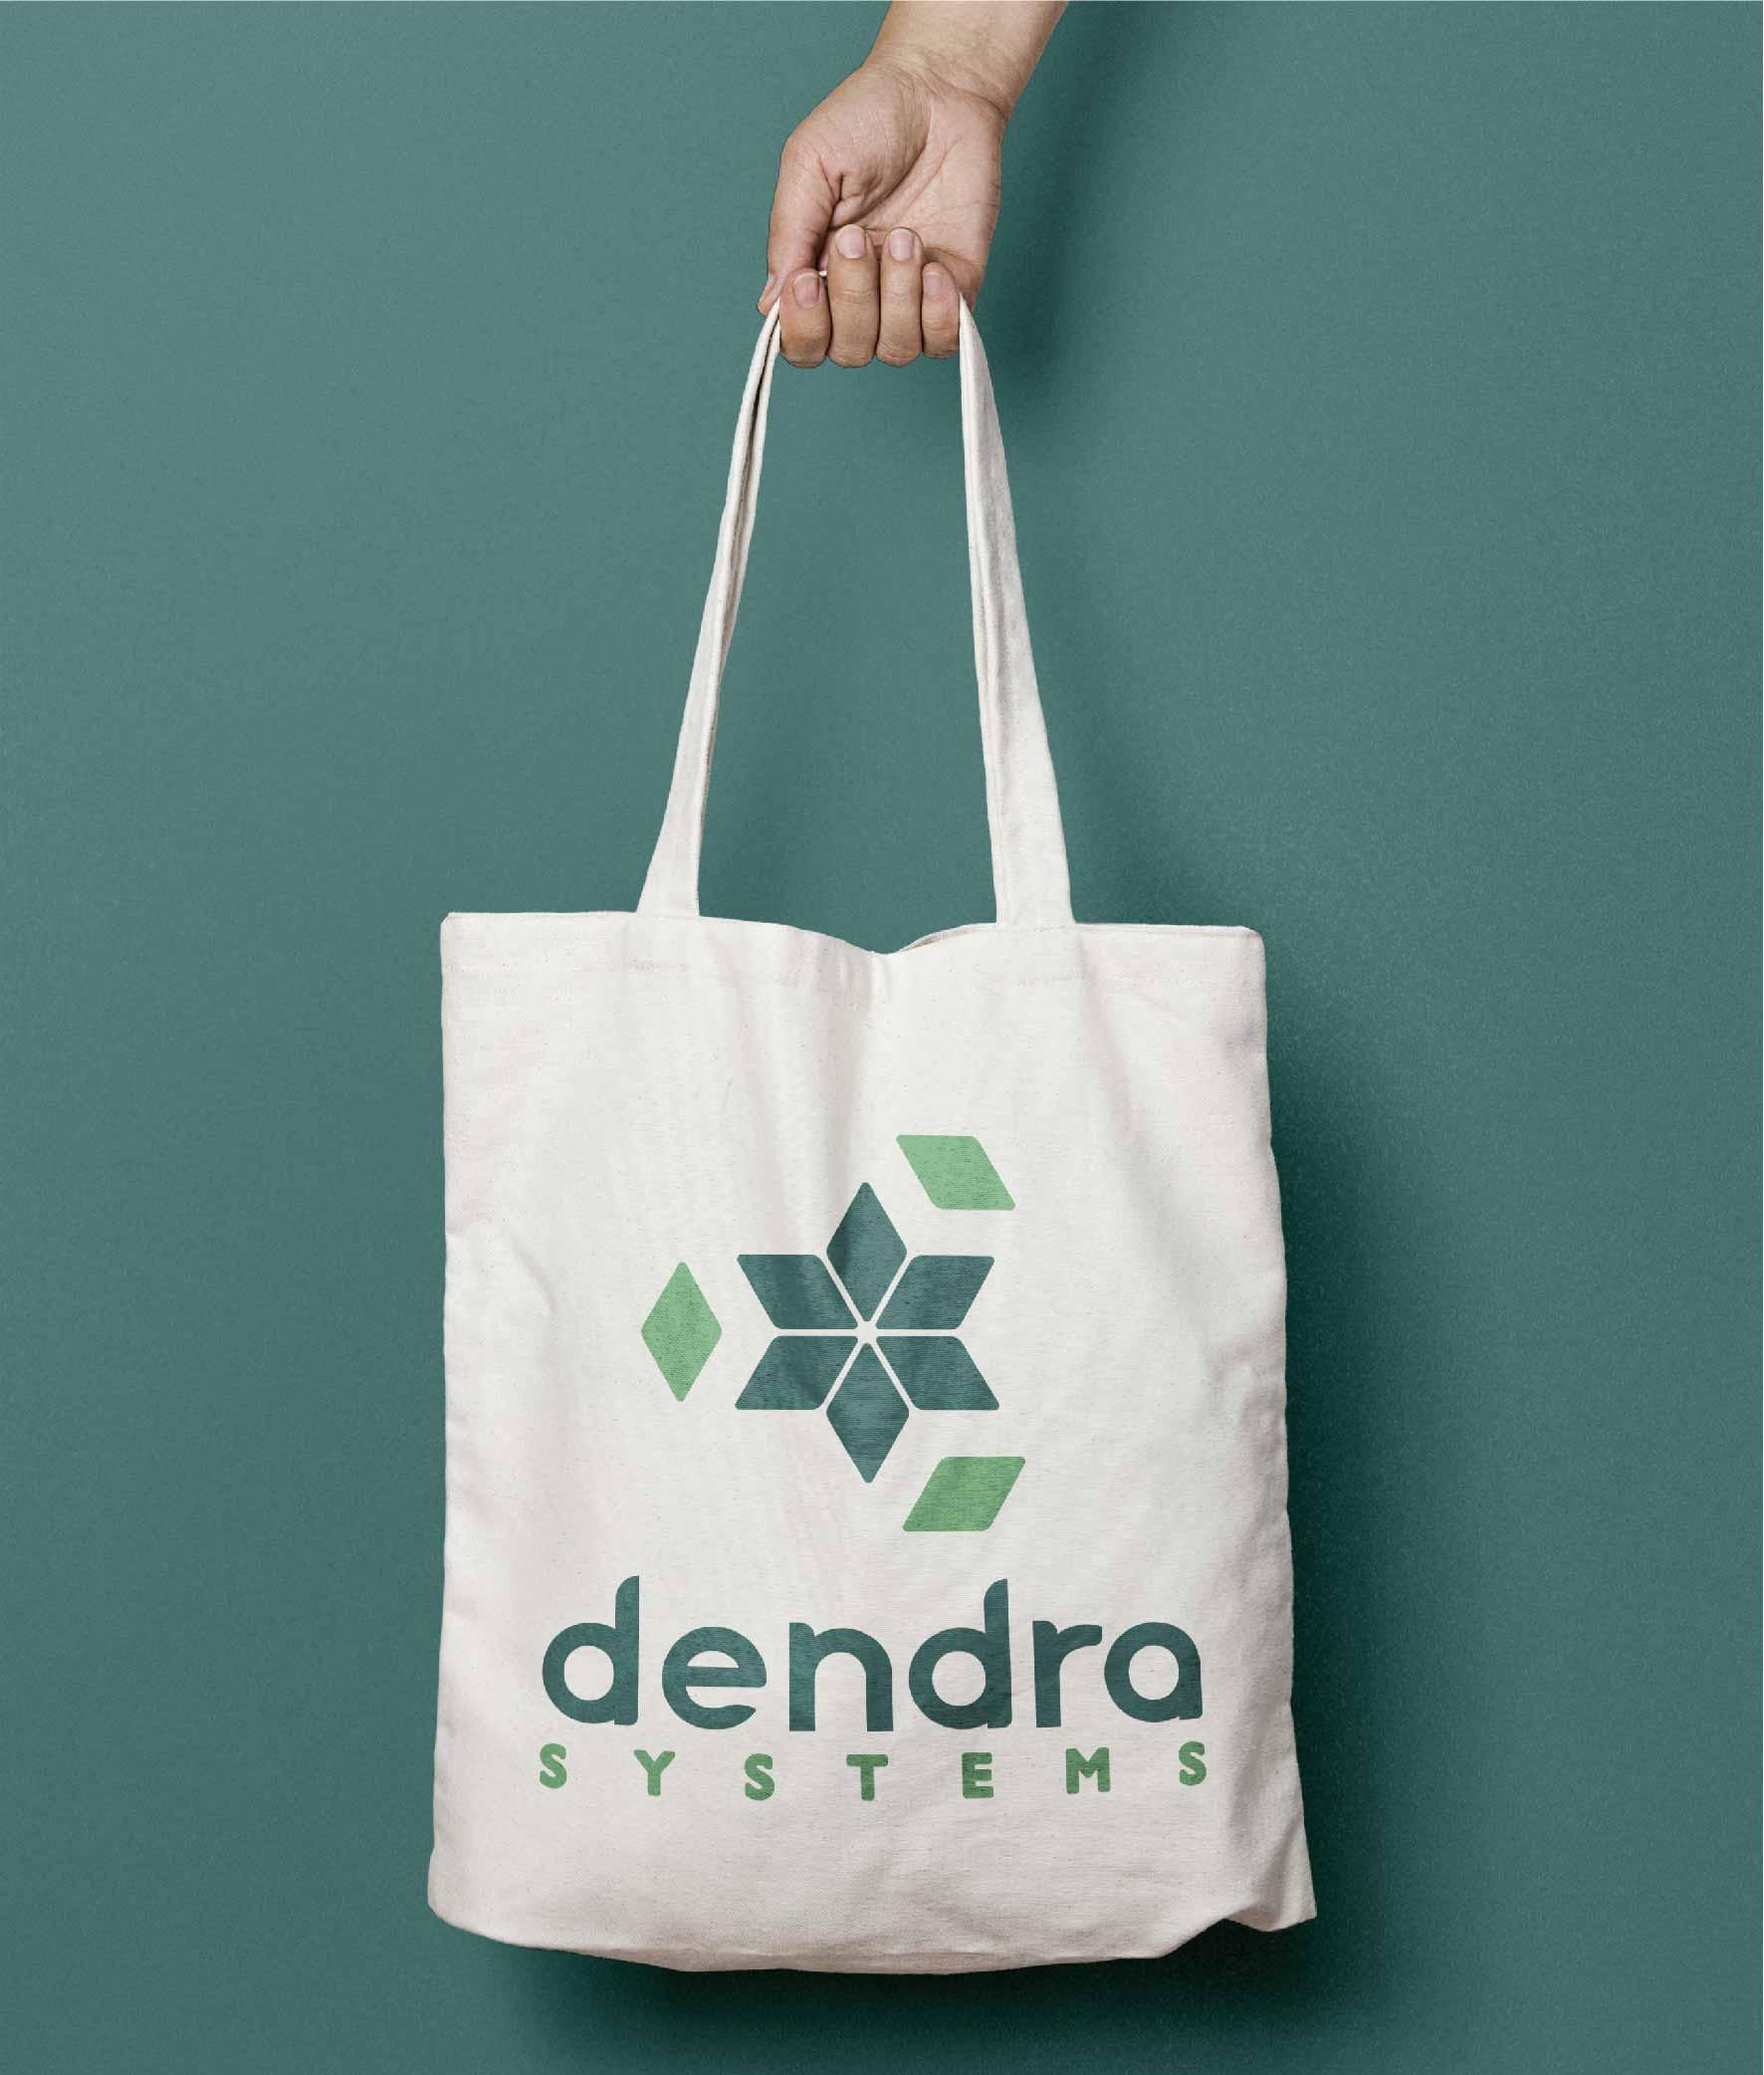 brand design on canvas bag green logo